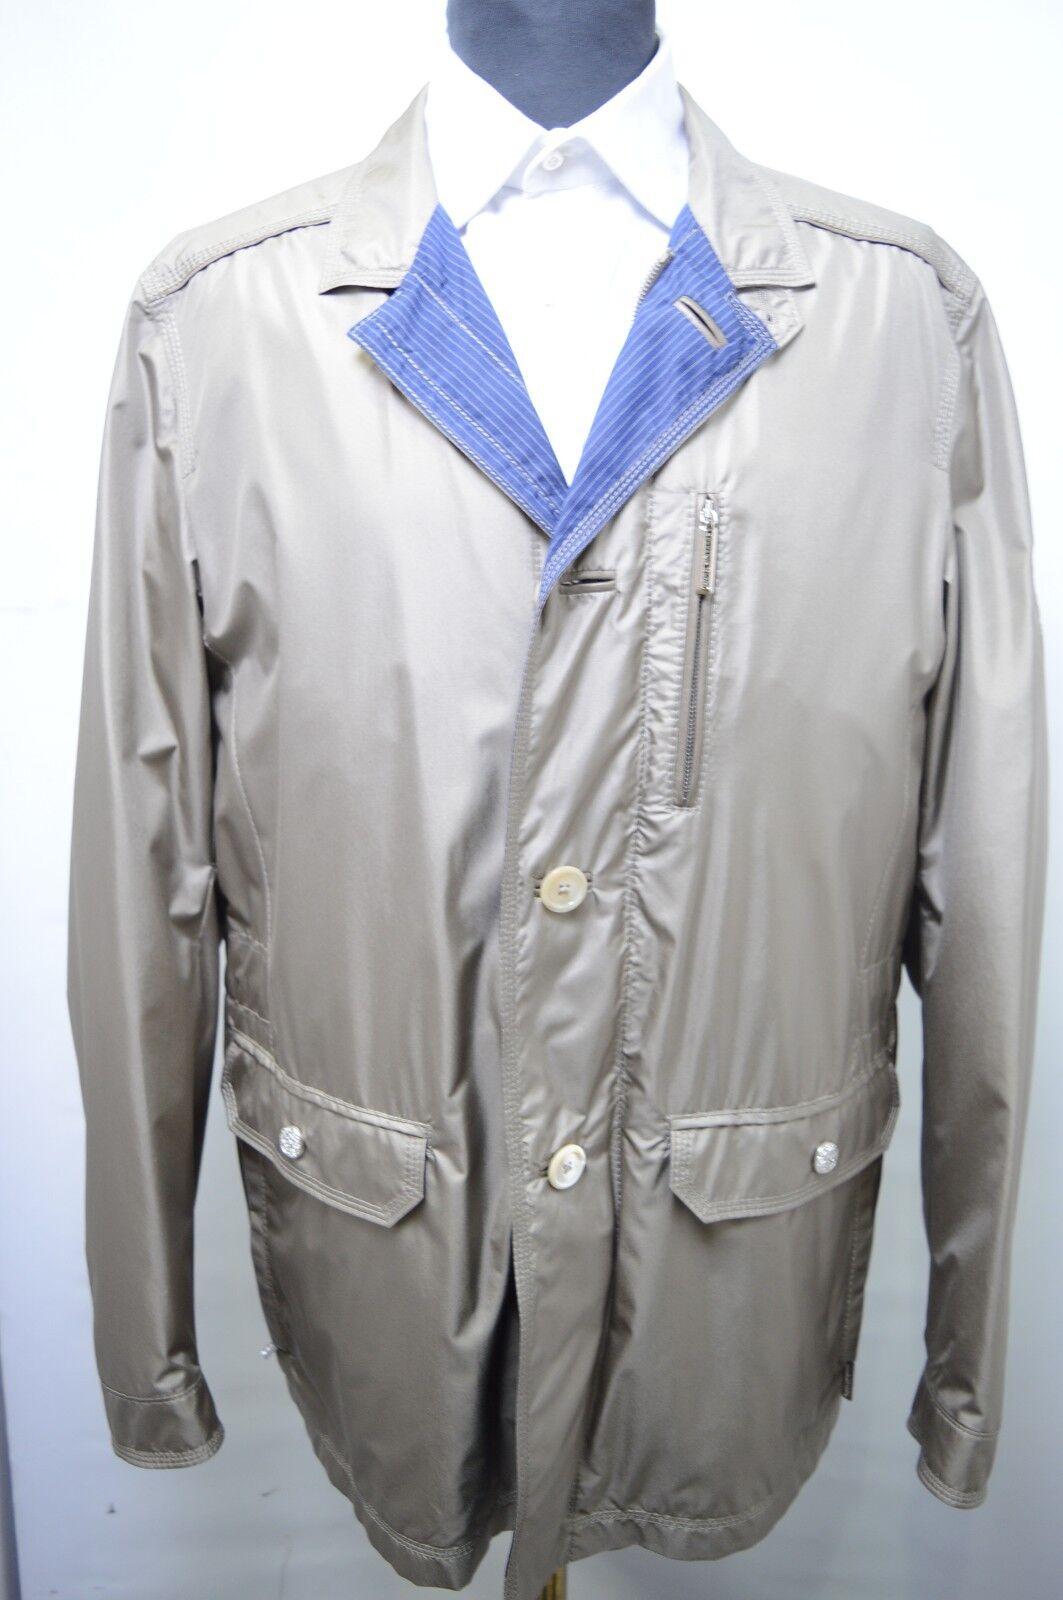 NEW 7250,00  STEFANO RICCI  Outwear Top Over Coat  Us M Eu 50 (G138)